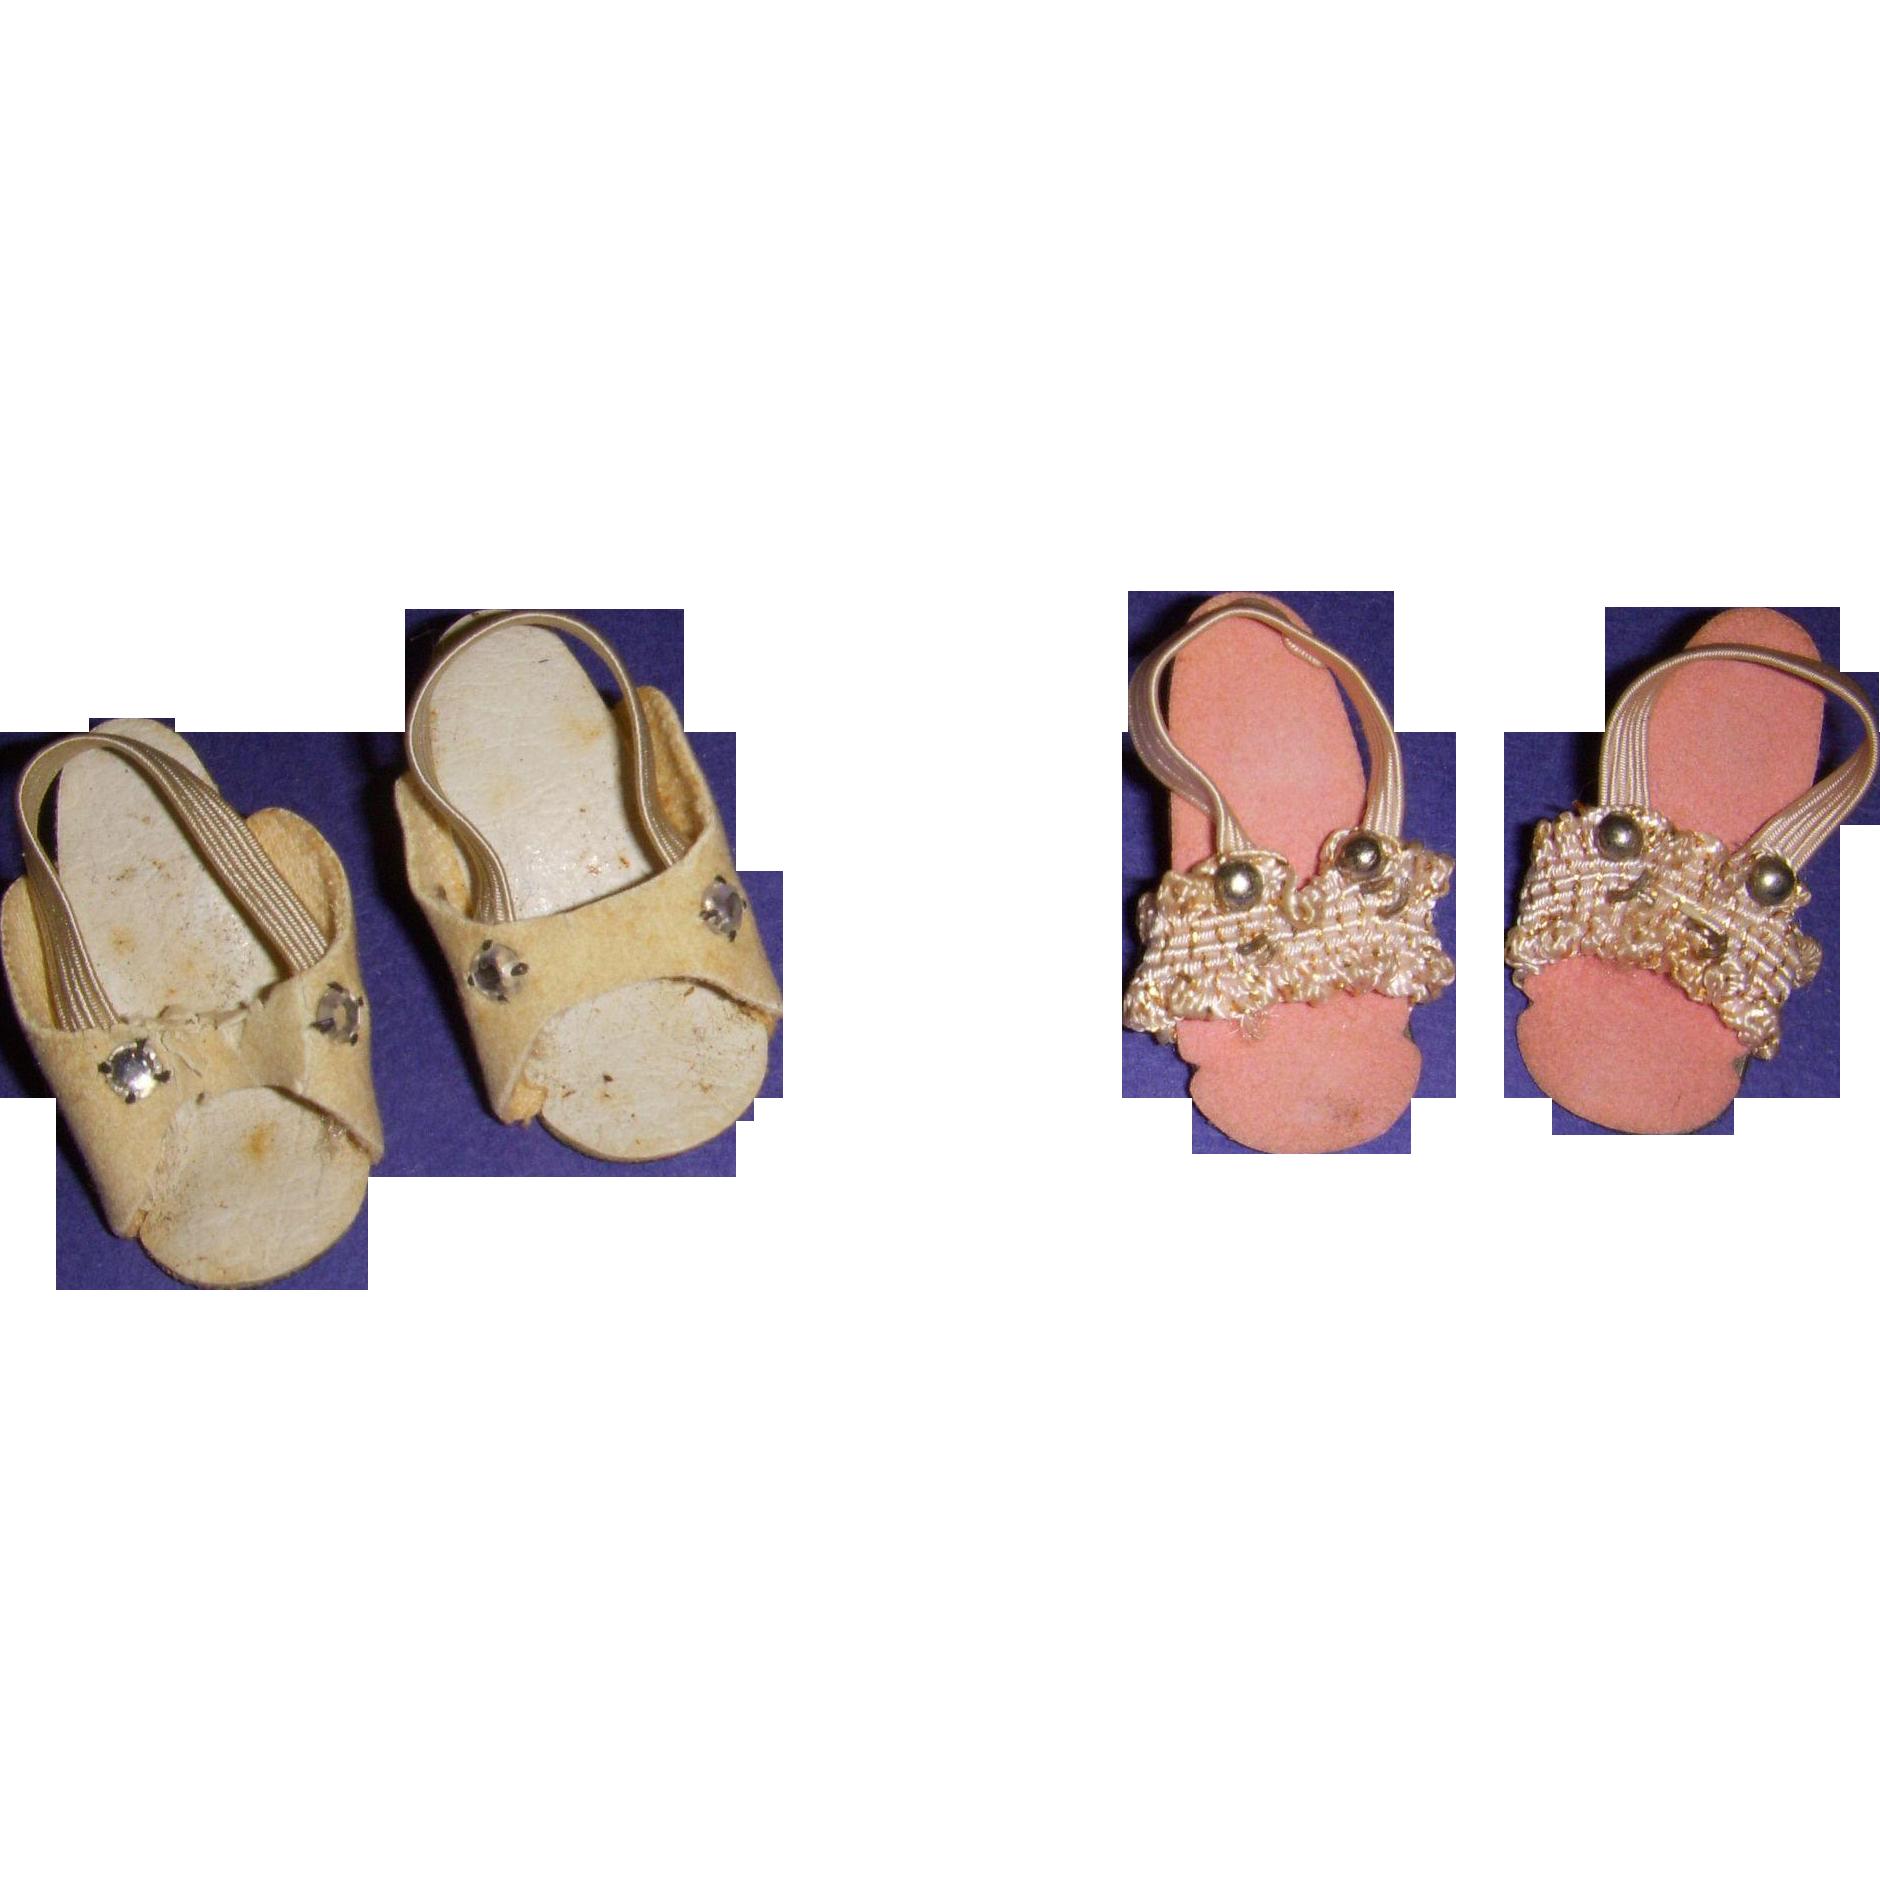 Vintage 1950s Fashion Doll High Heels